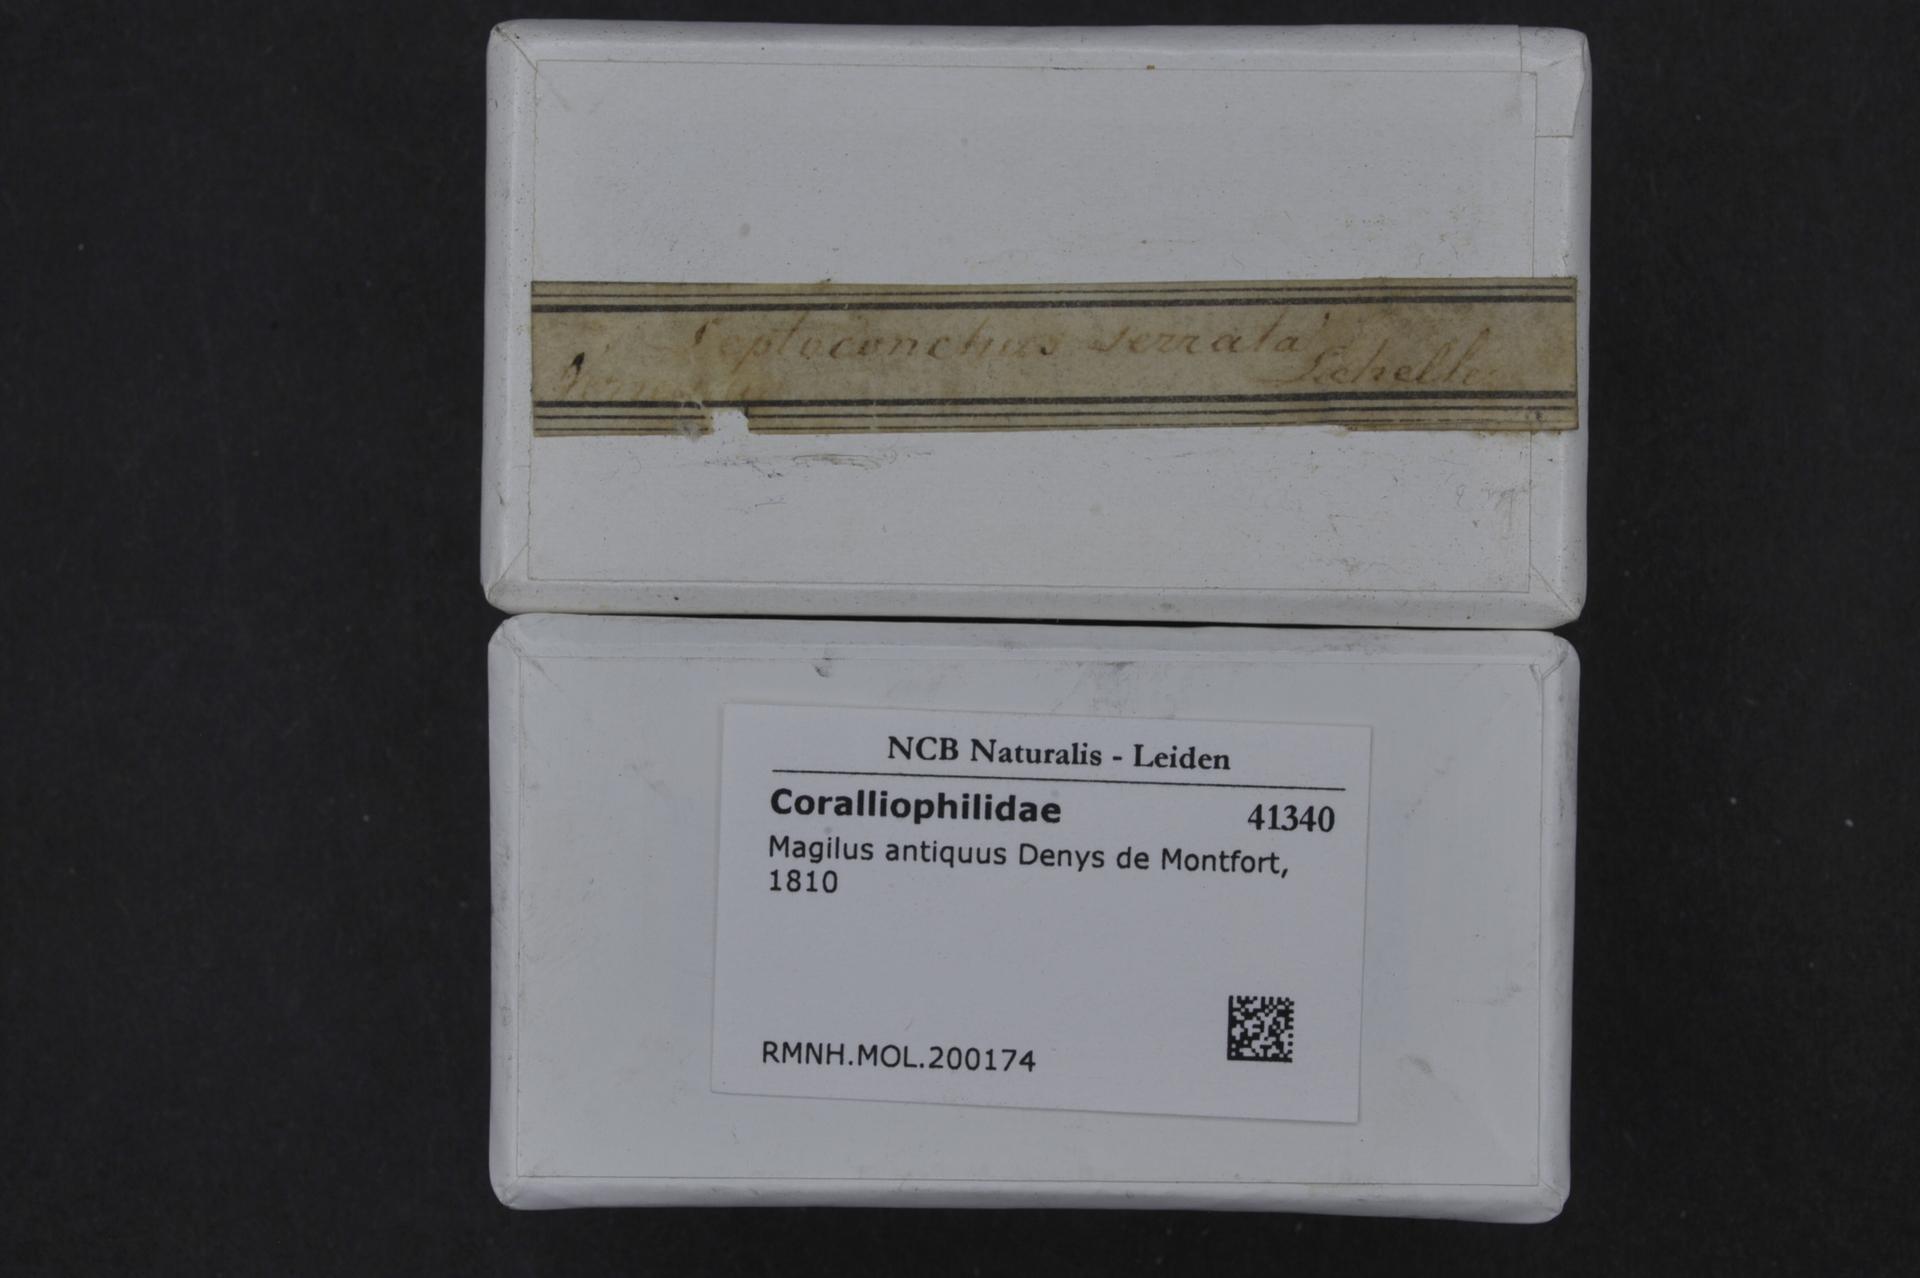 RMNH.MOL.200174 | Magilus antiquus Denys de Montfort, 1810